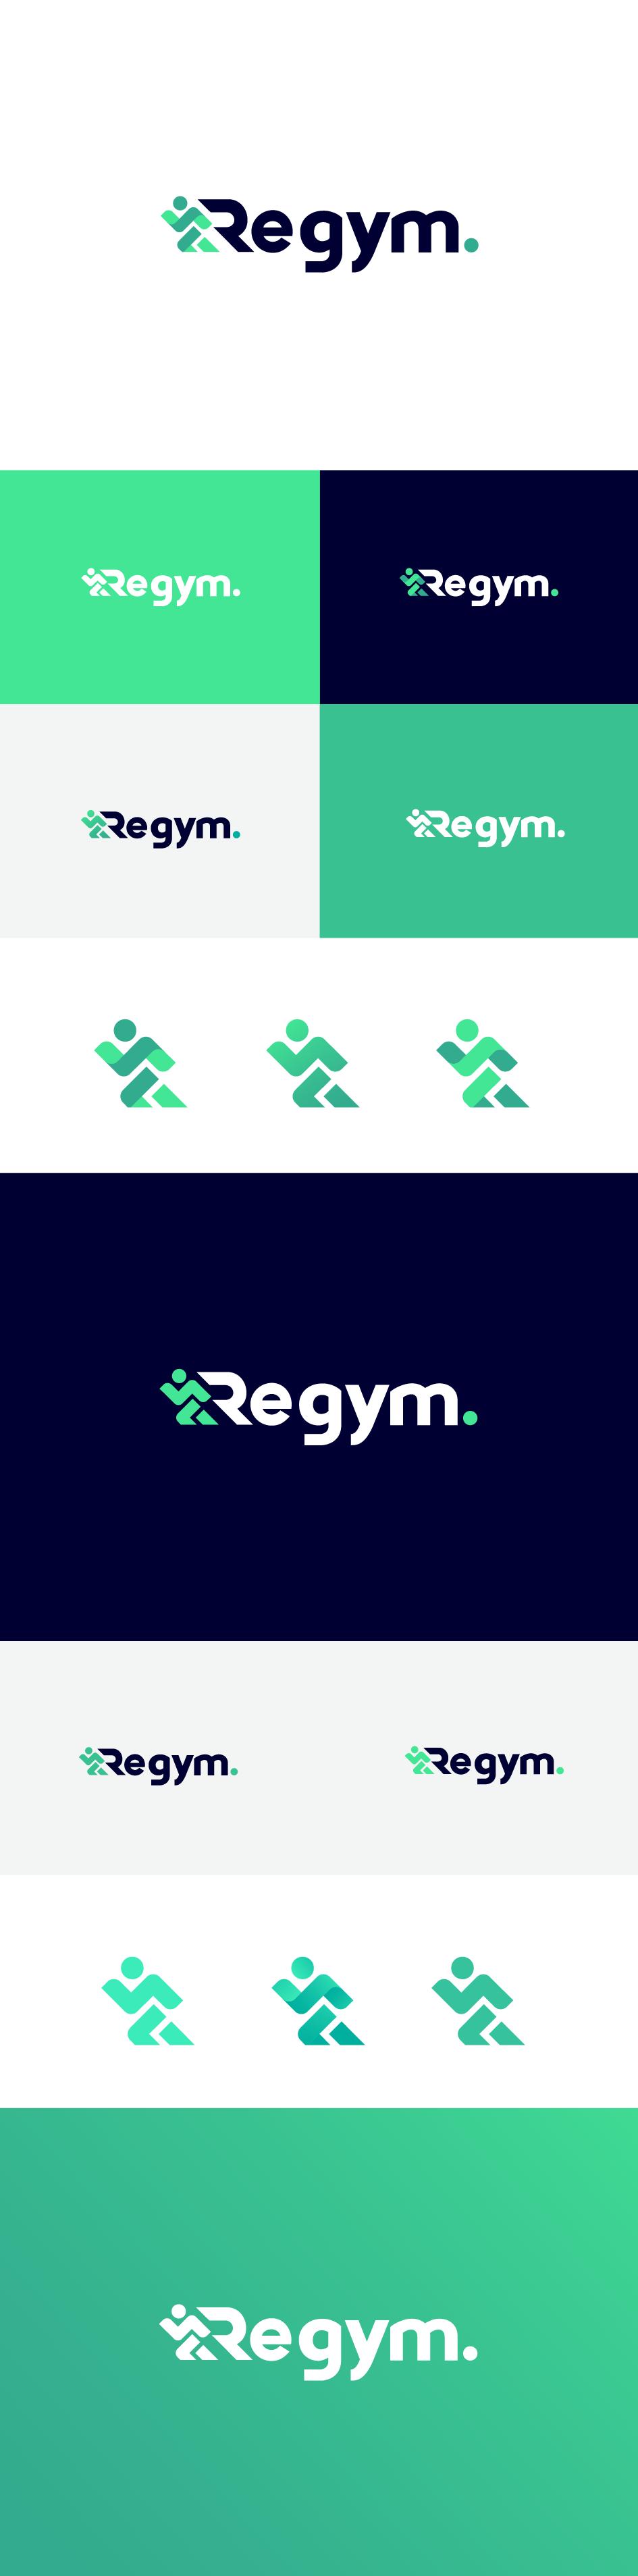 Regym